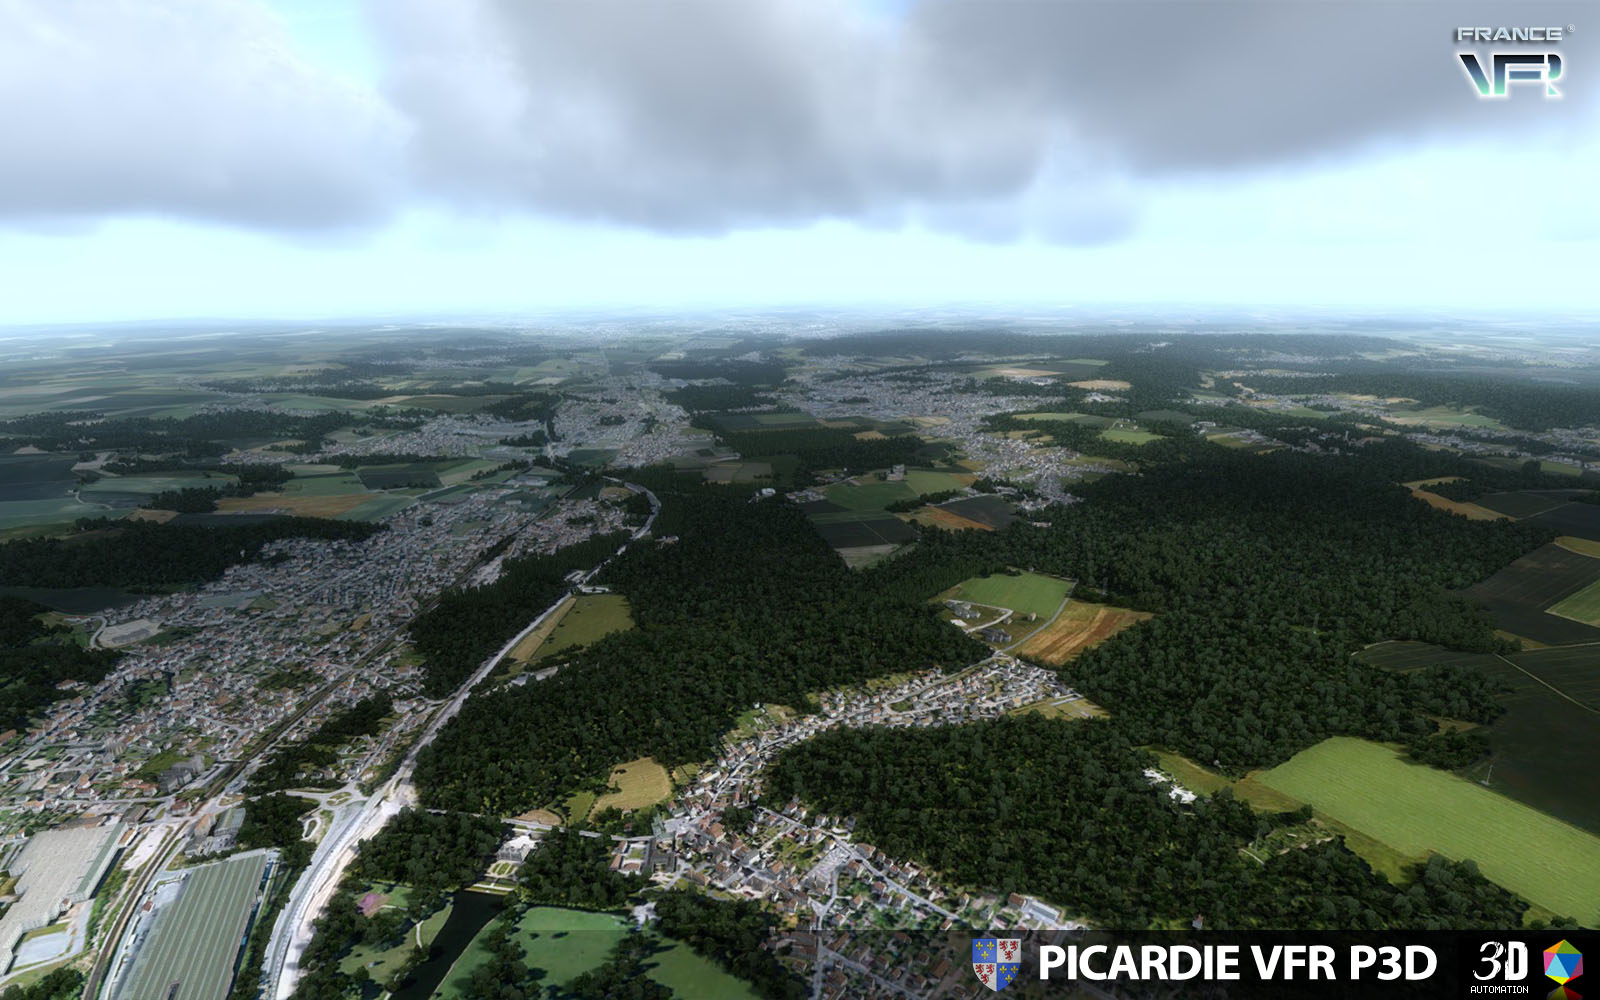 VFRPICP3D_11.jpg